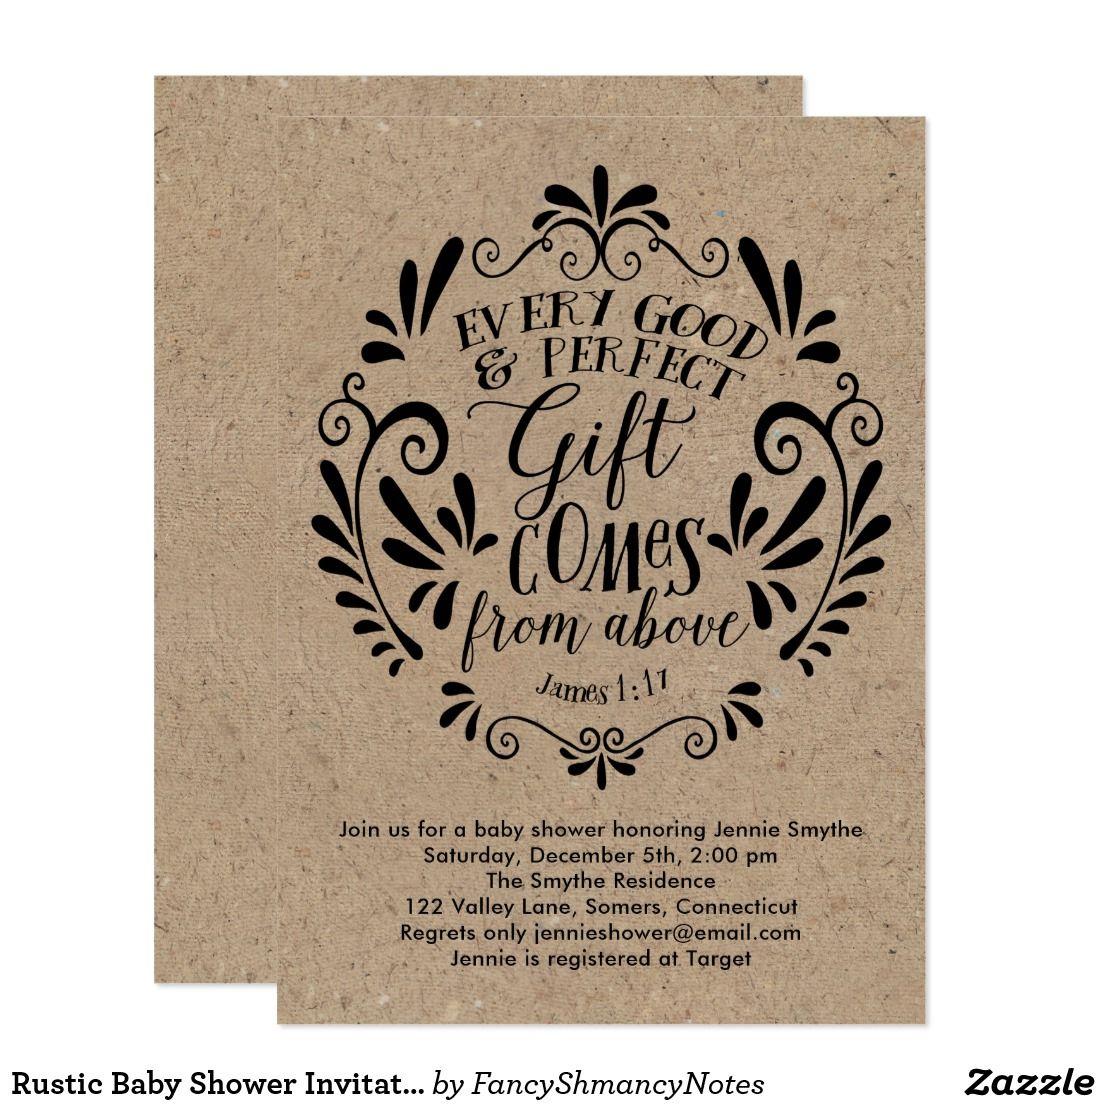 Rustic Baby Shower Invitation, Typography on Kraft Card | Rustic ...